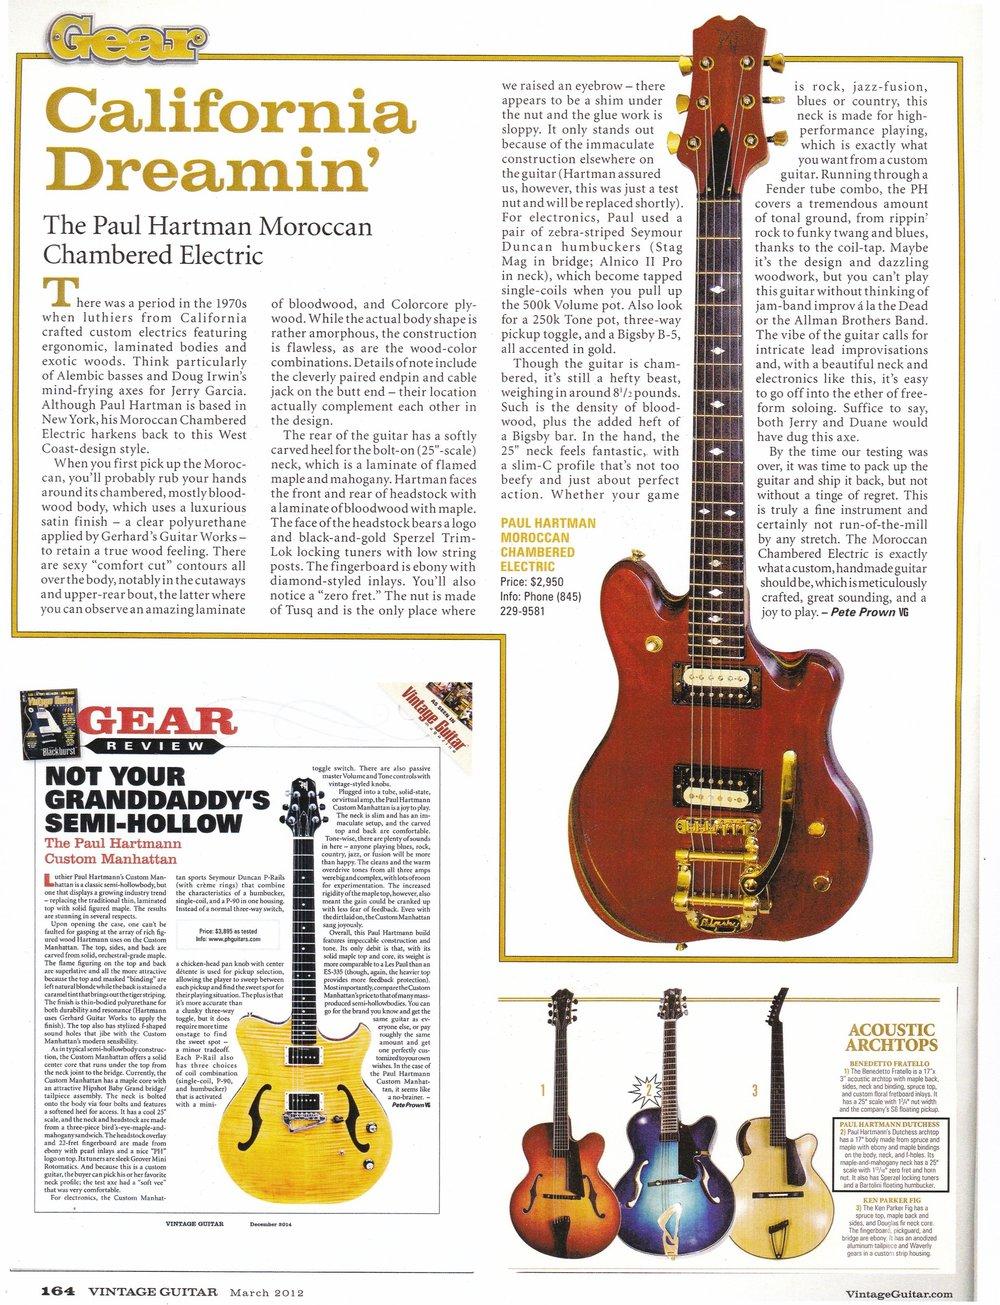 Vintage Guitar March, 2012